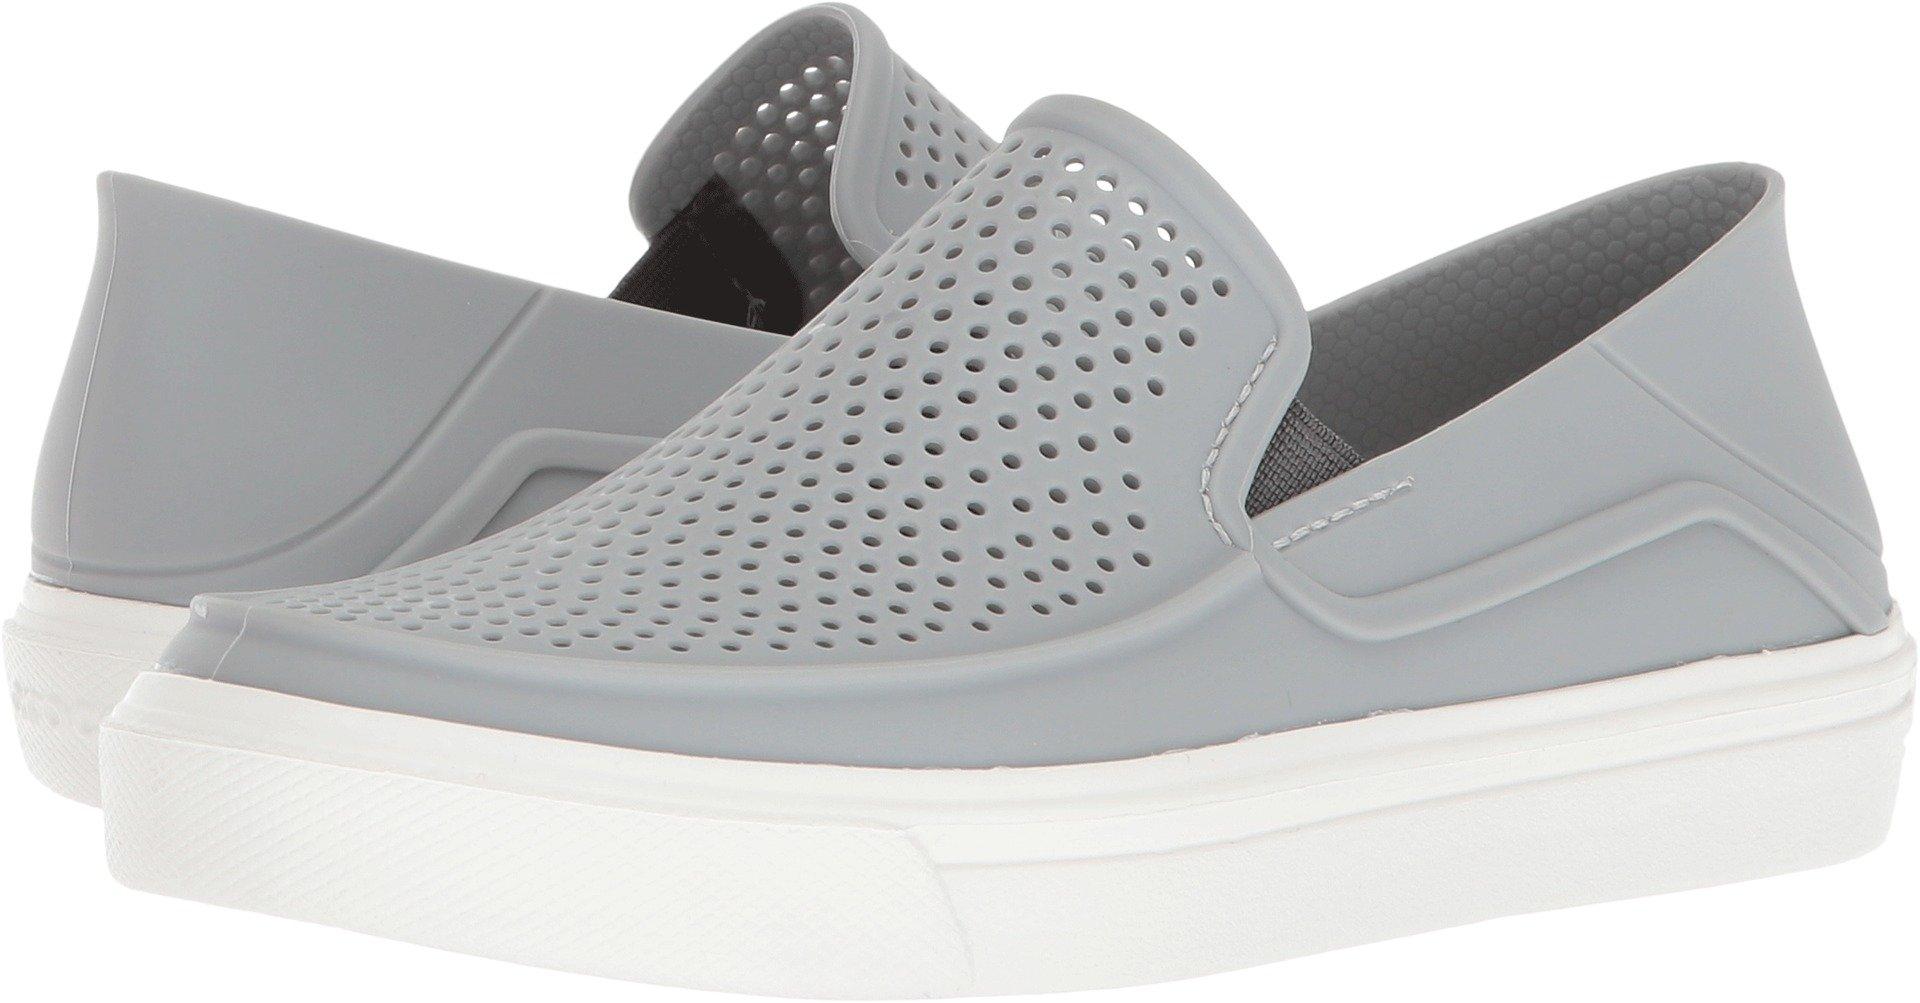 Crocs Kids' Citilane Roka Slip-On, Light Grey/White, 2 M US Little Kid by Crocs